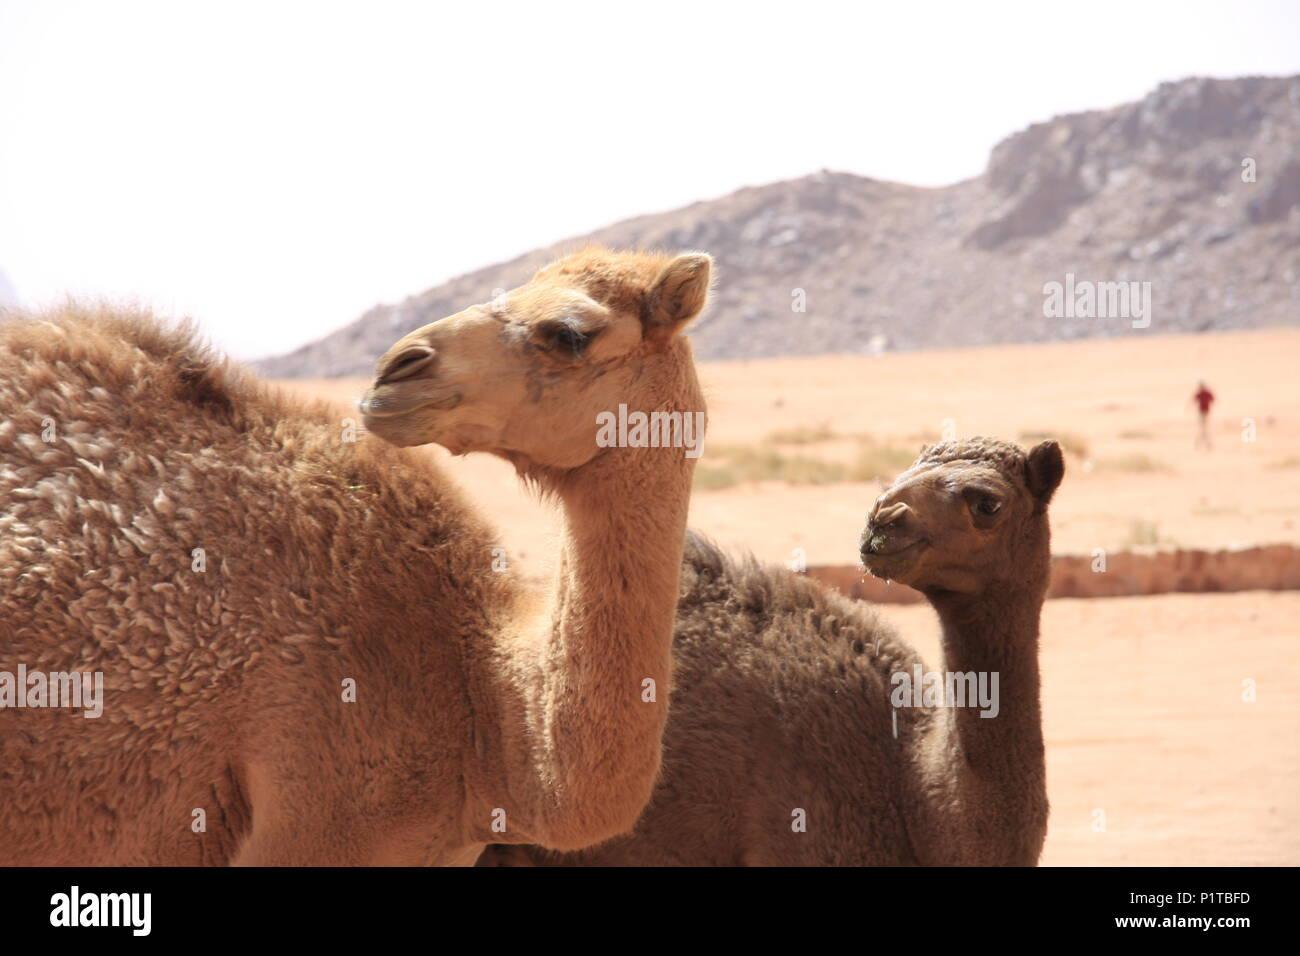 Camels at a watering hole in Wadi Rum, Jordan's Desert - Stock Image